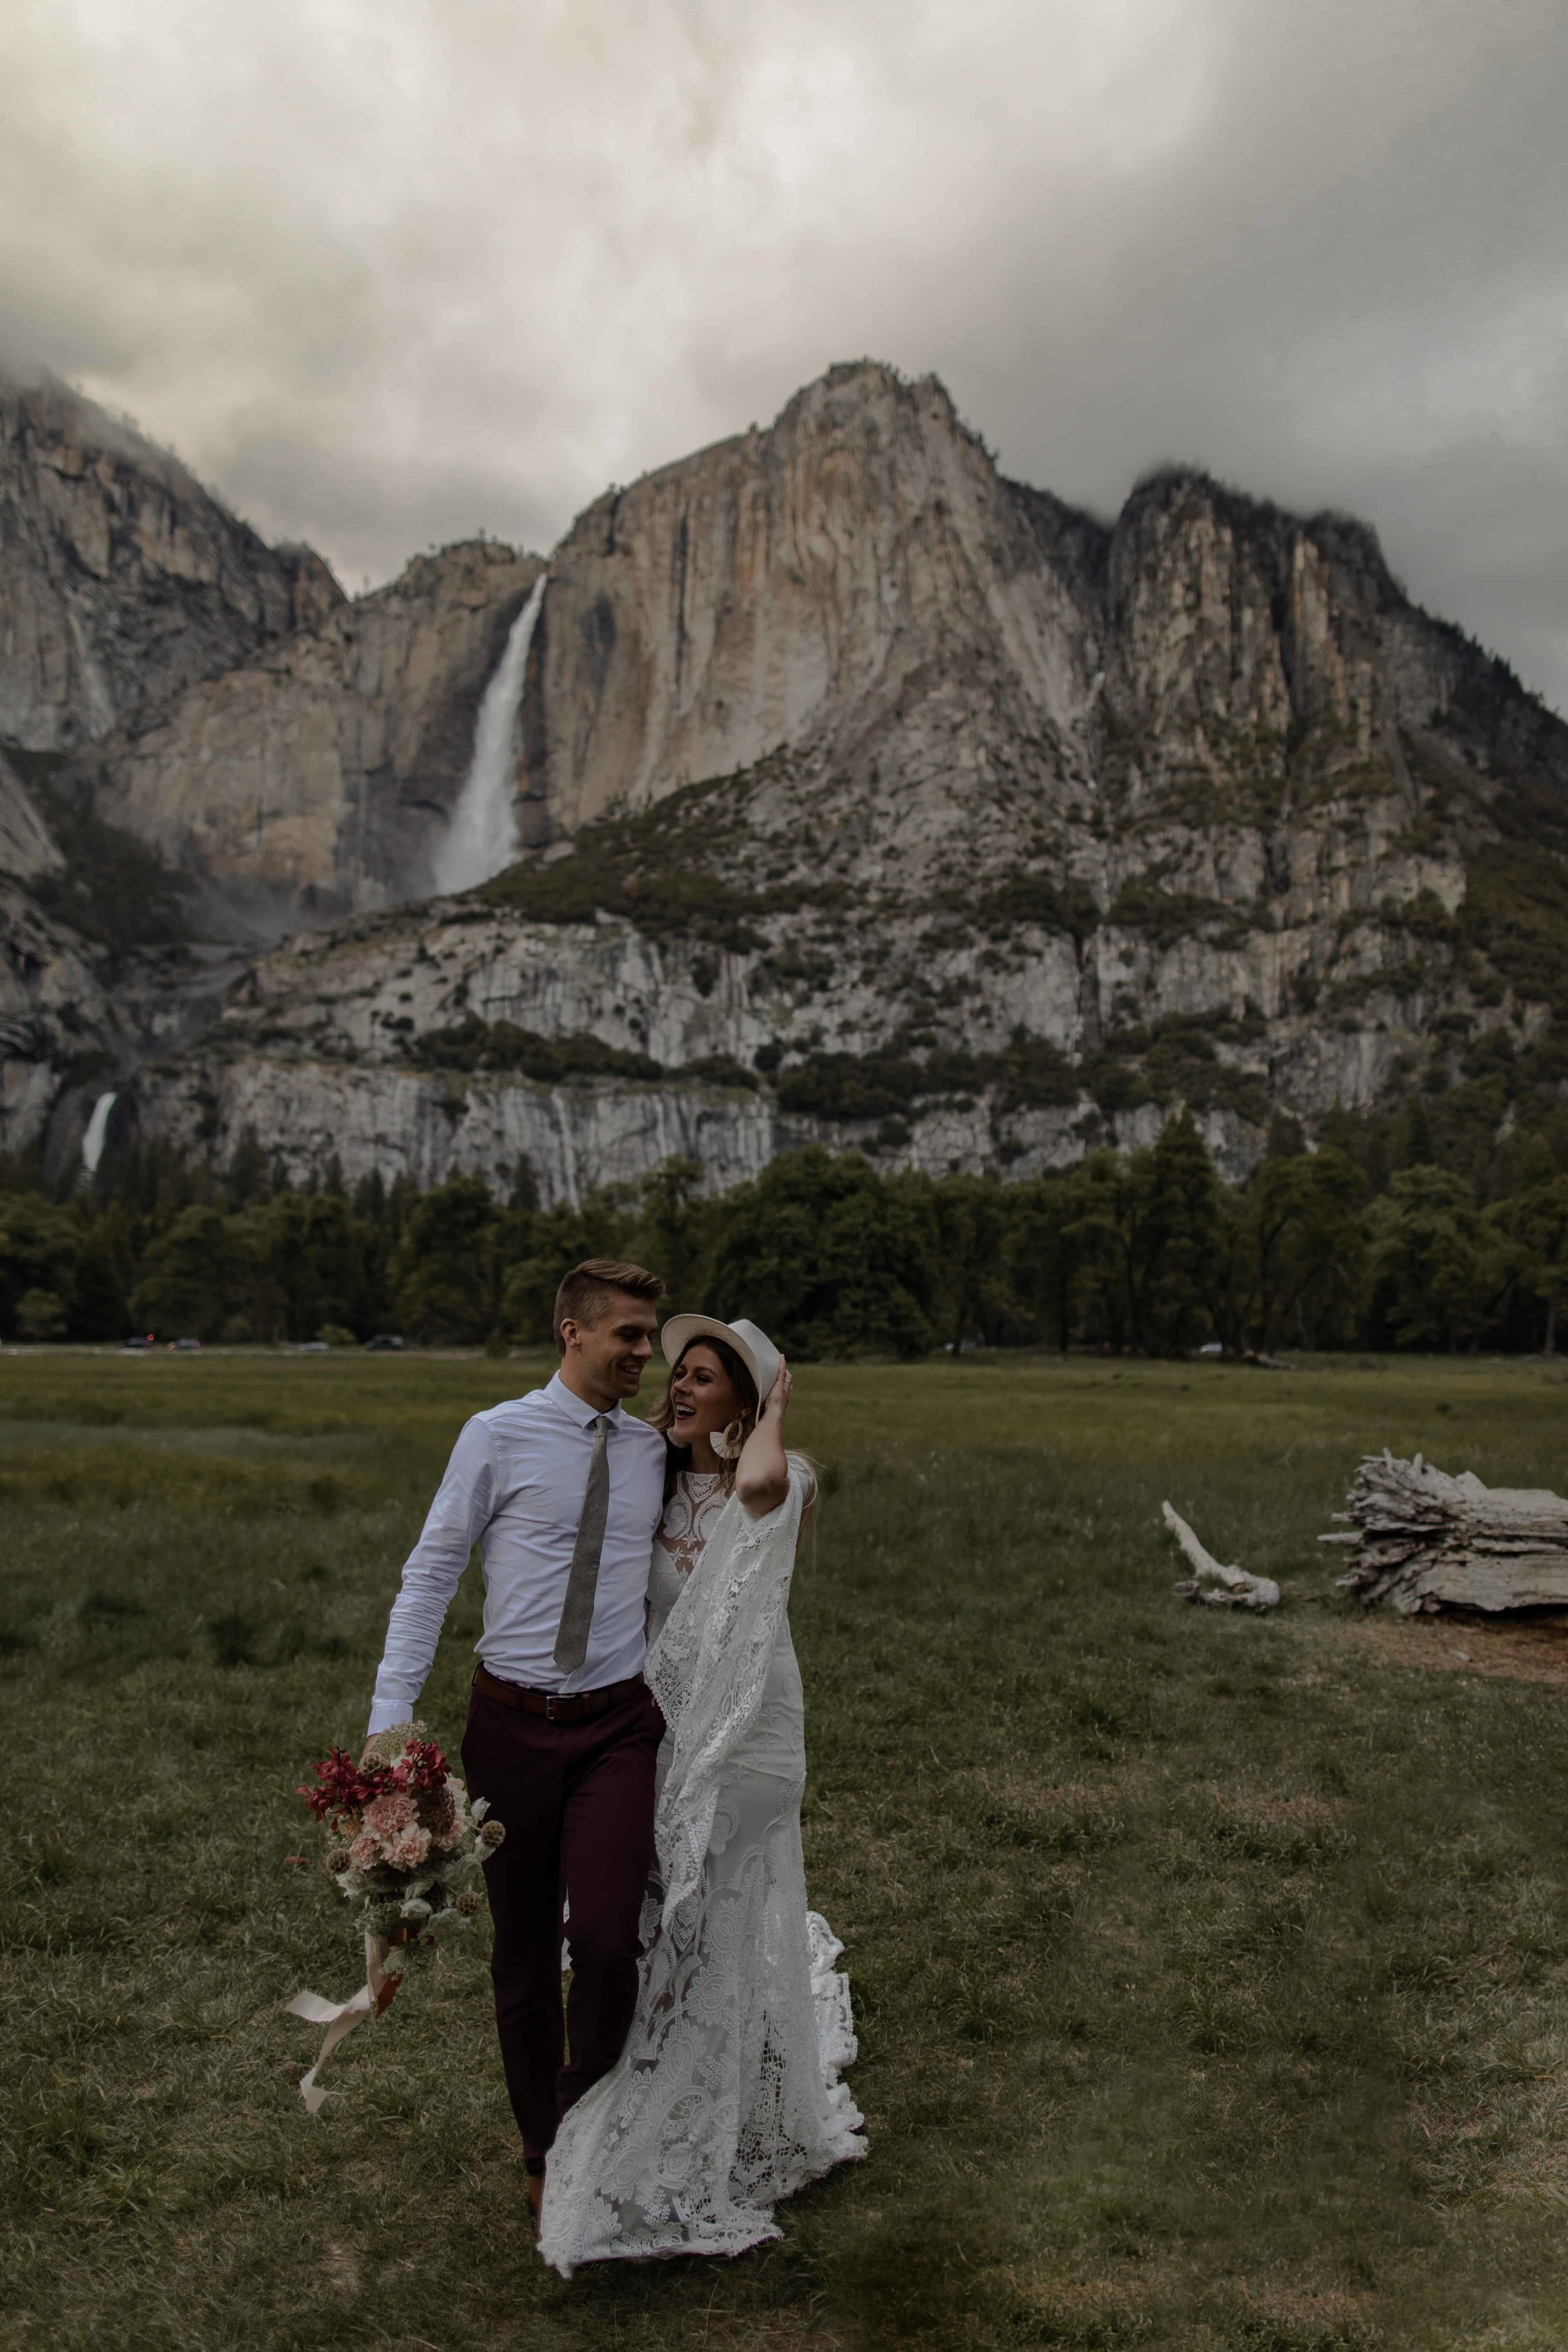 getting-married-in-yosemite-ideas.jpg